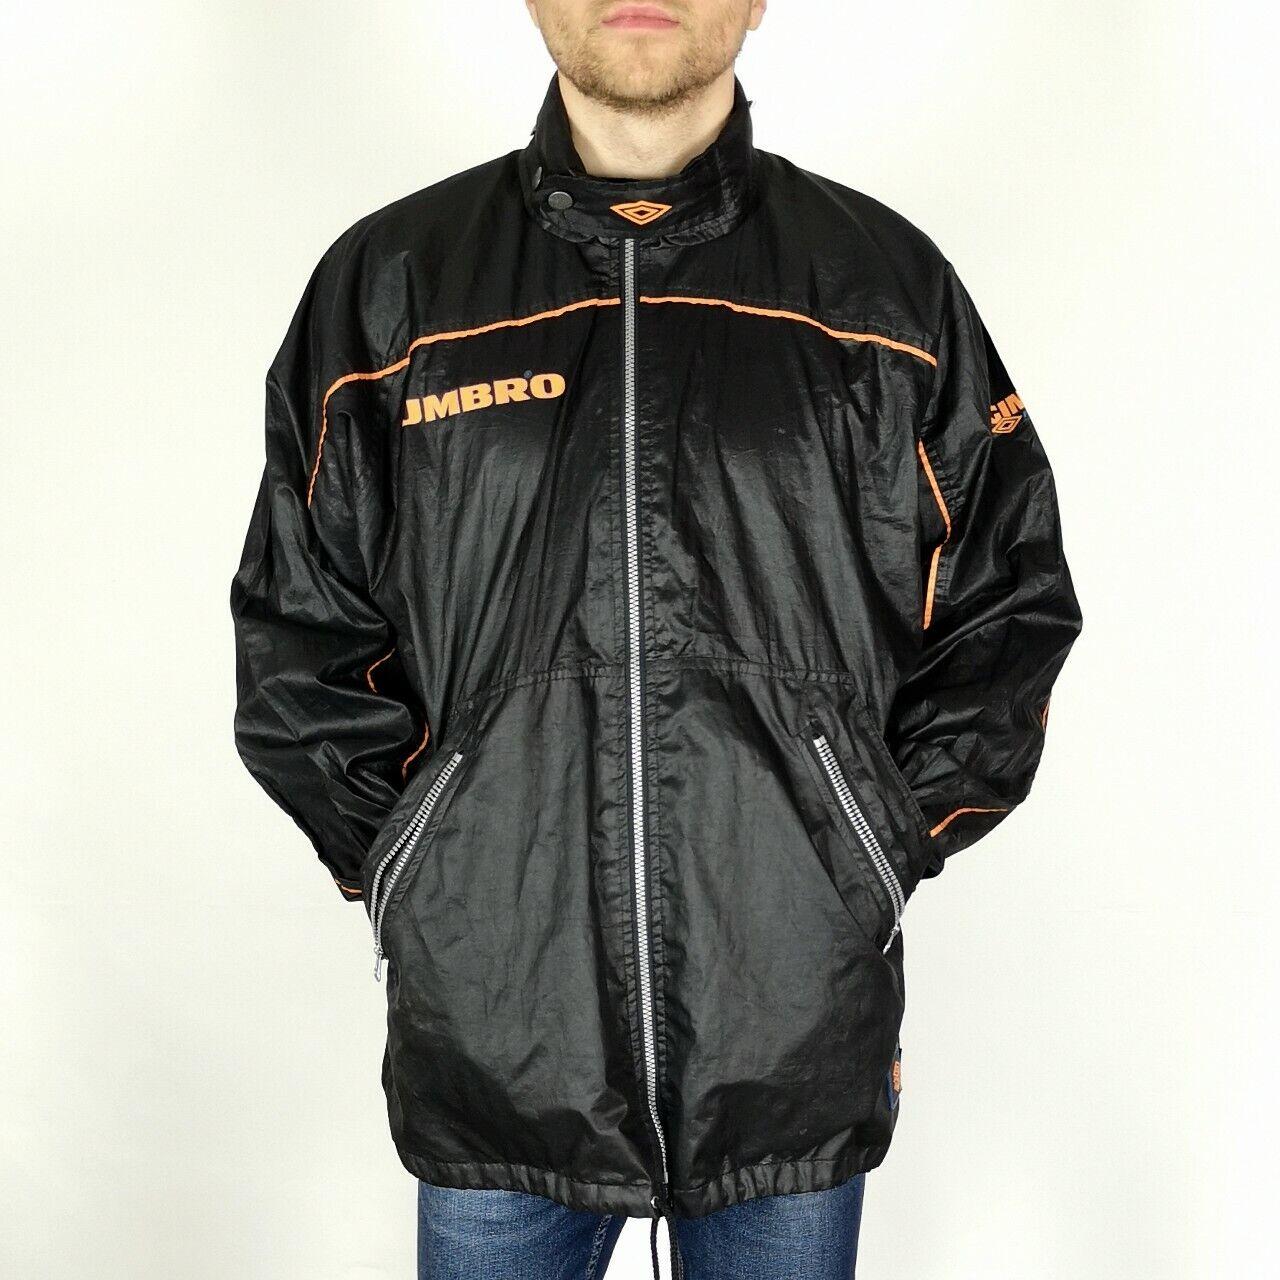 umbro waterproof jacket